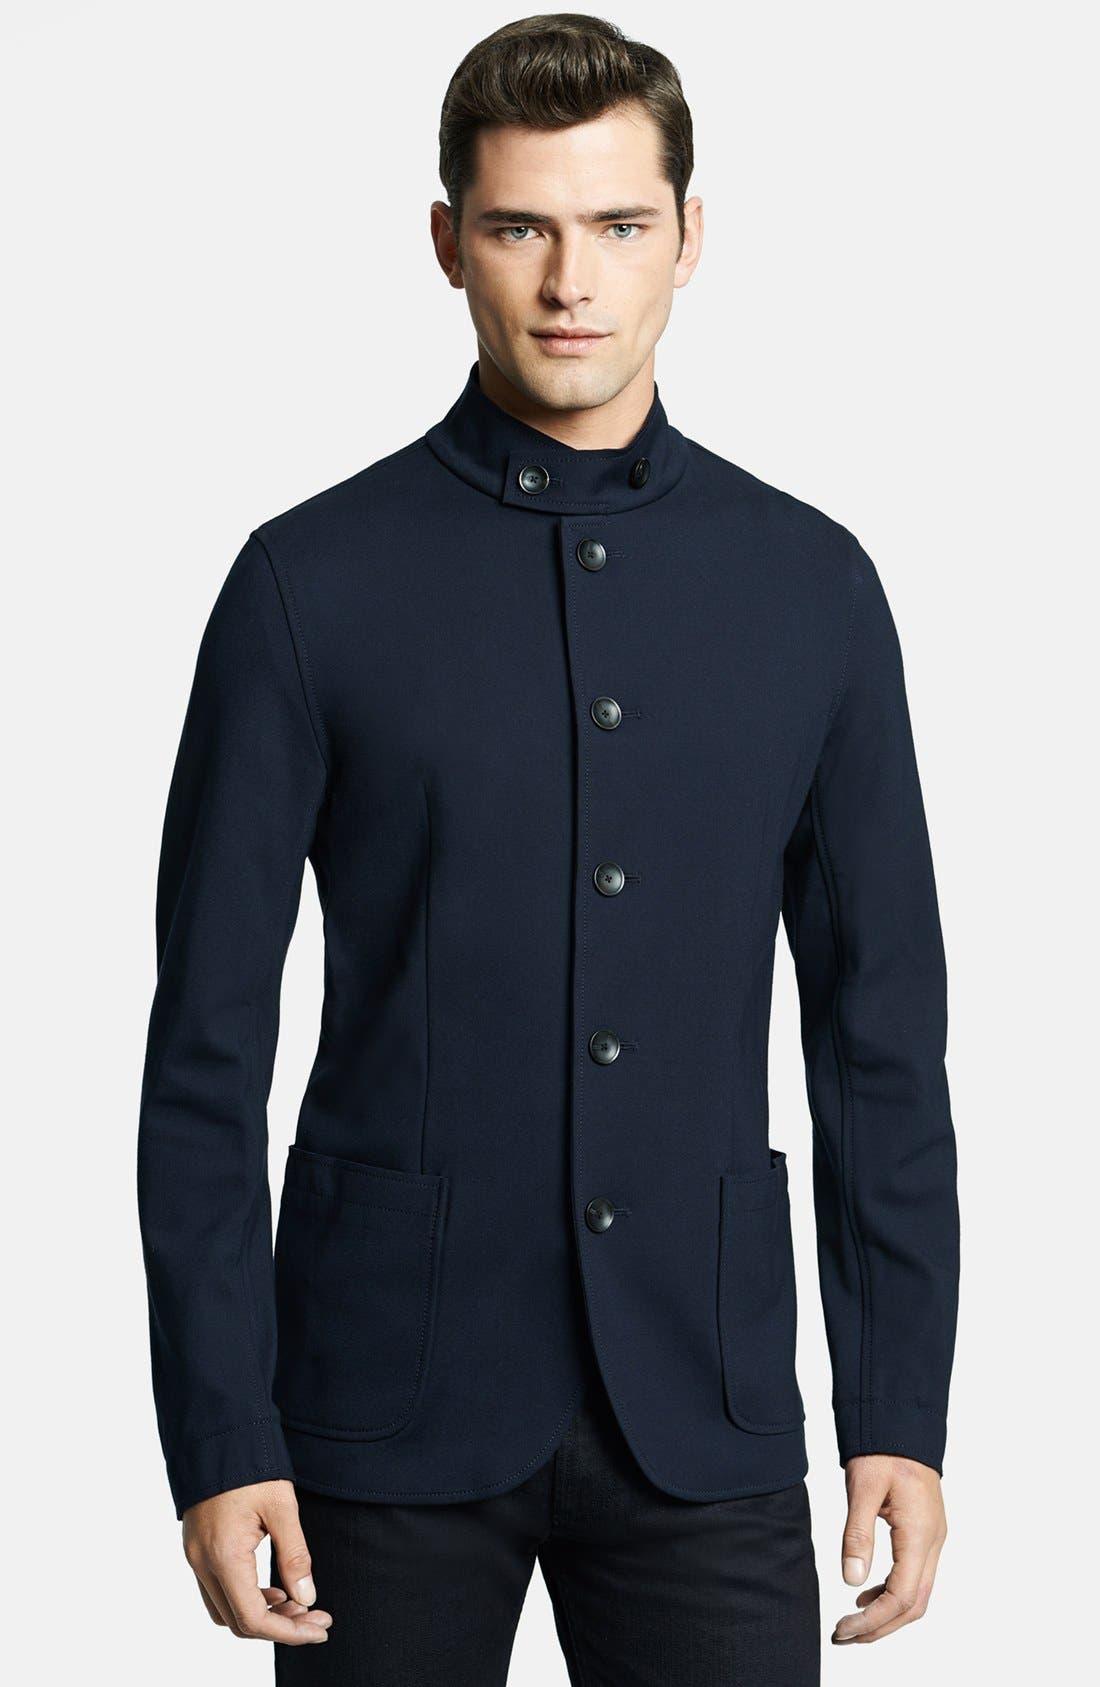 Alternate Image 1 Selected - Armani Collezioni Ponte Neru Jacket